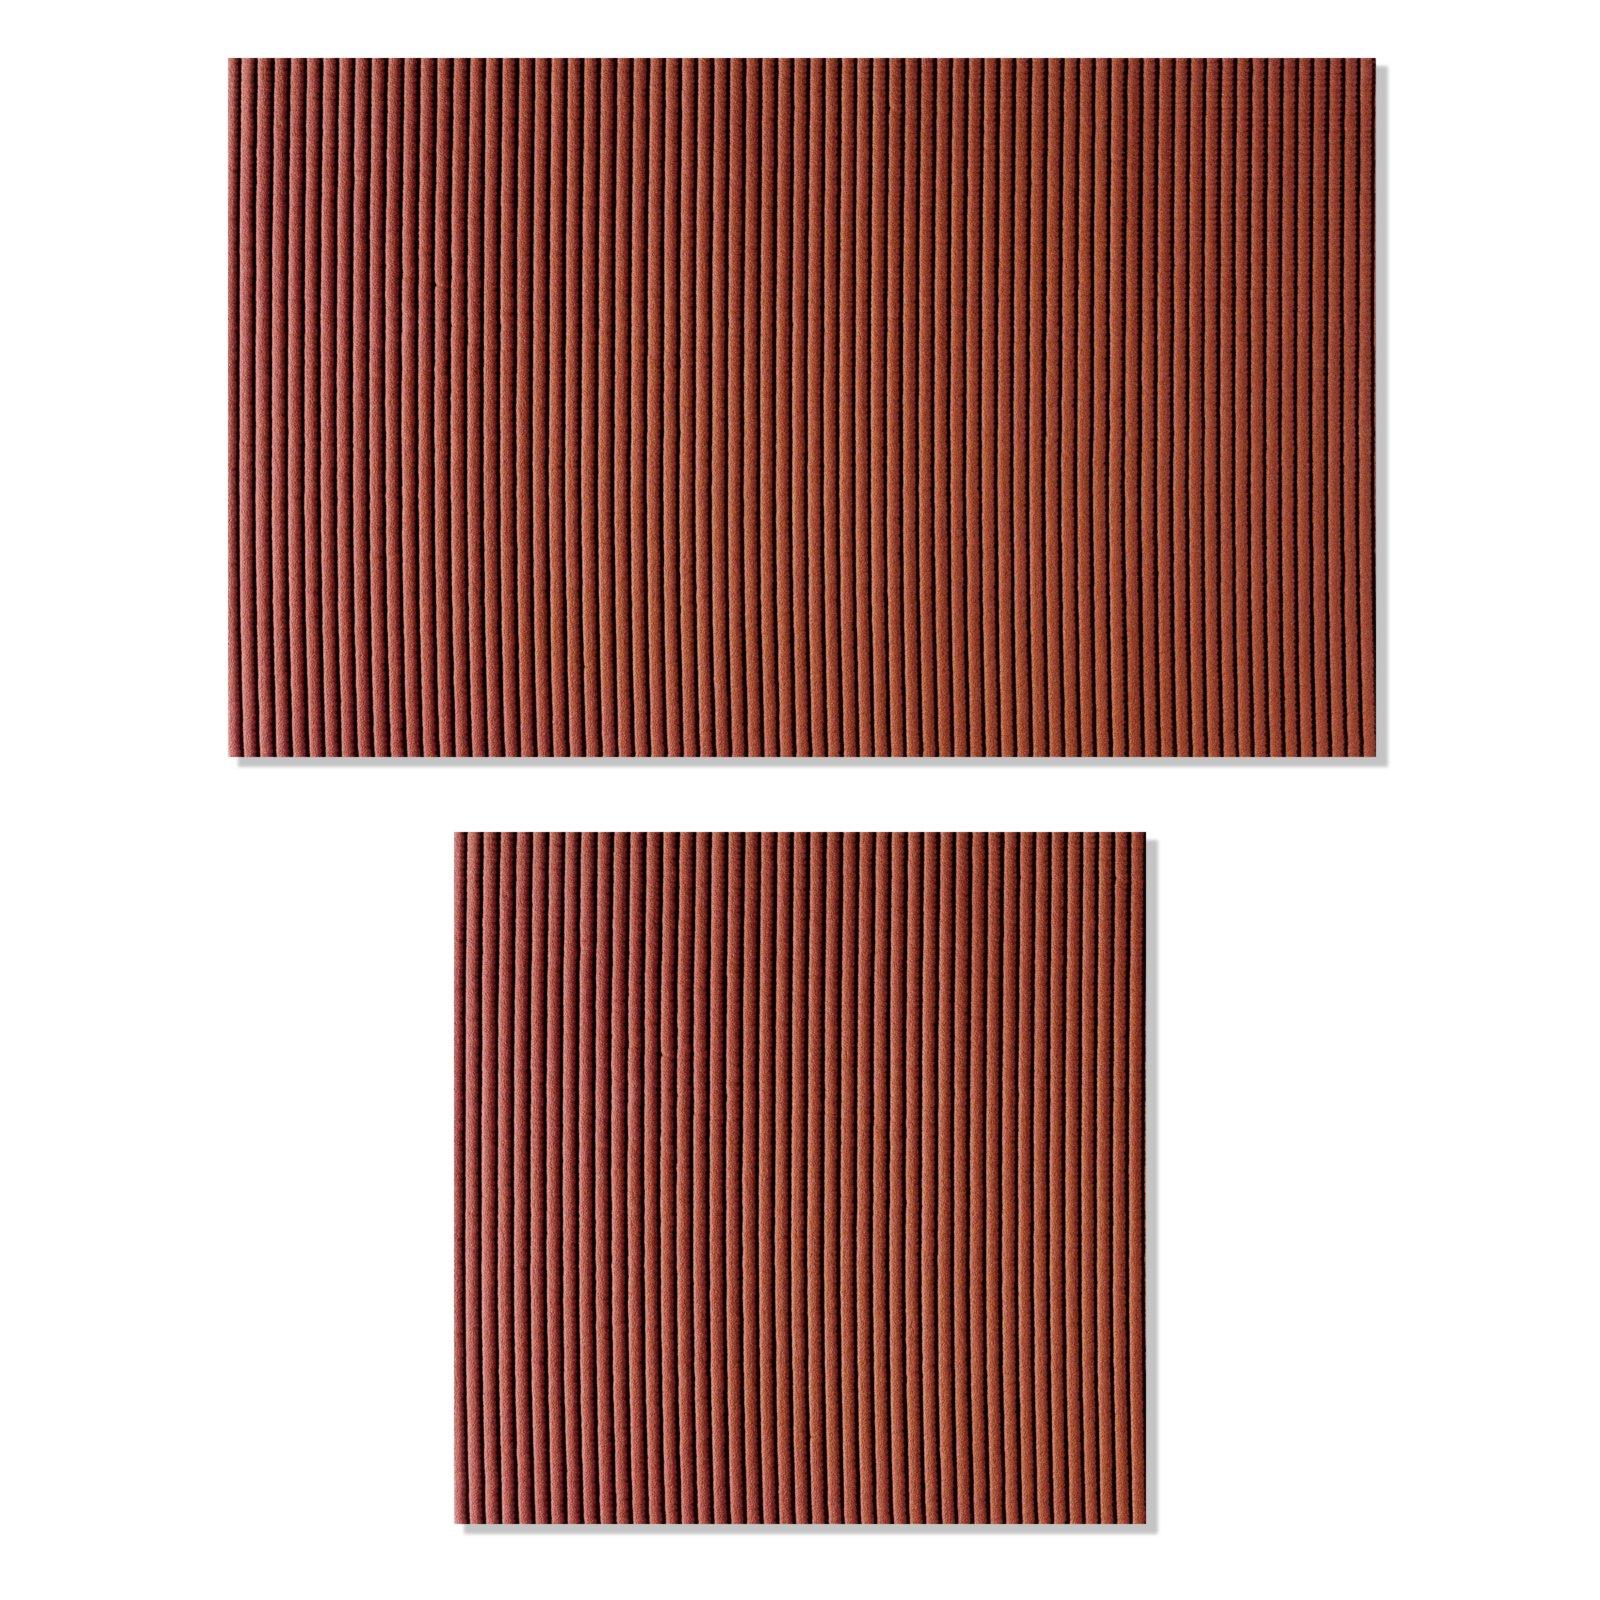 badvorleger braun 2er set badteppiche matten badtextilien heimtextilien deko. Black Bedroom Furniture Sets. Home Design Ideas